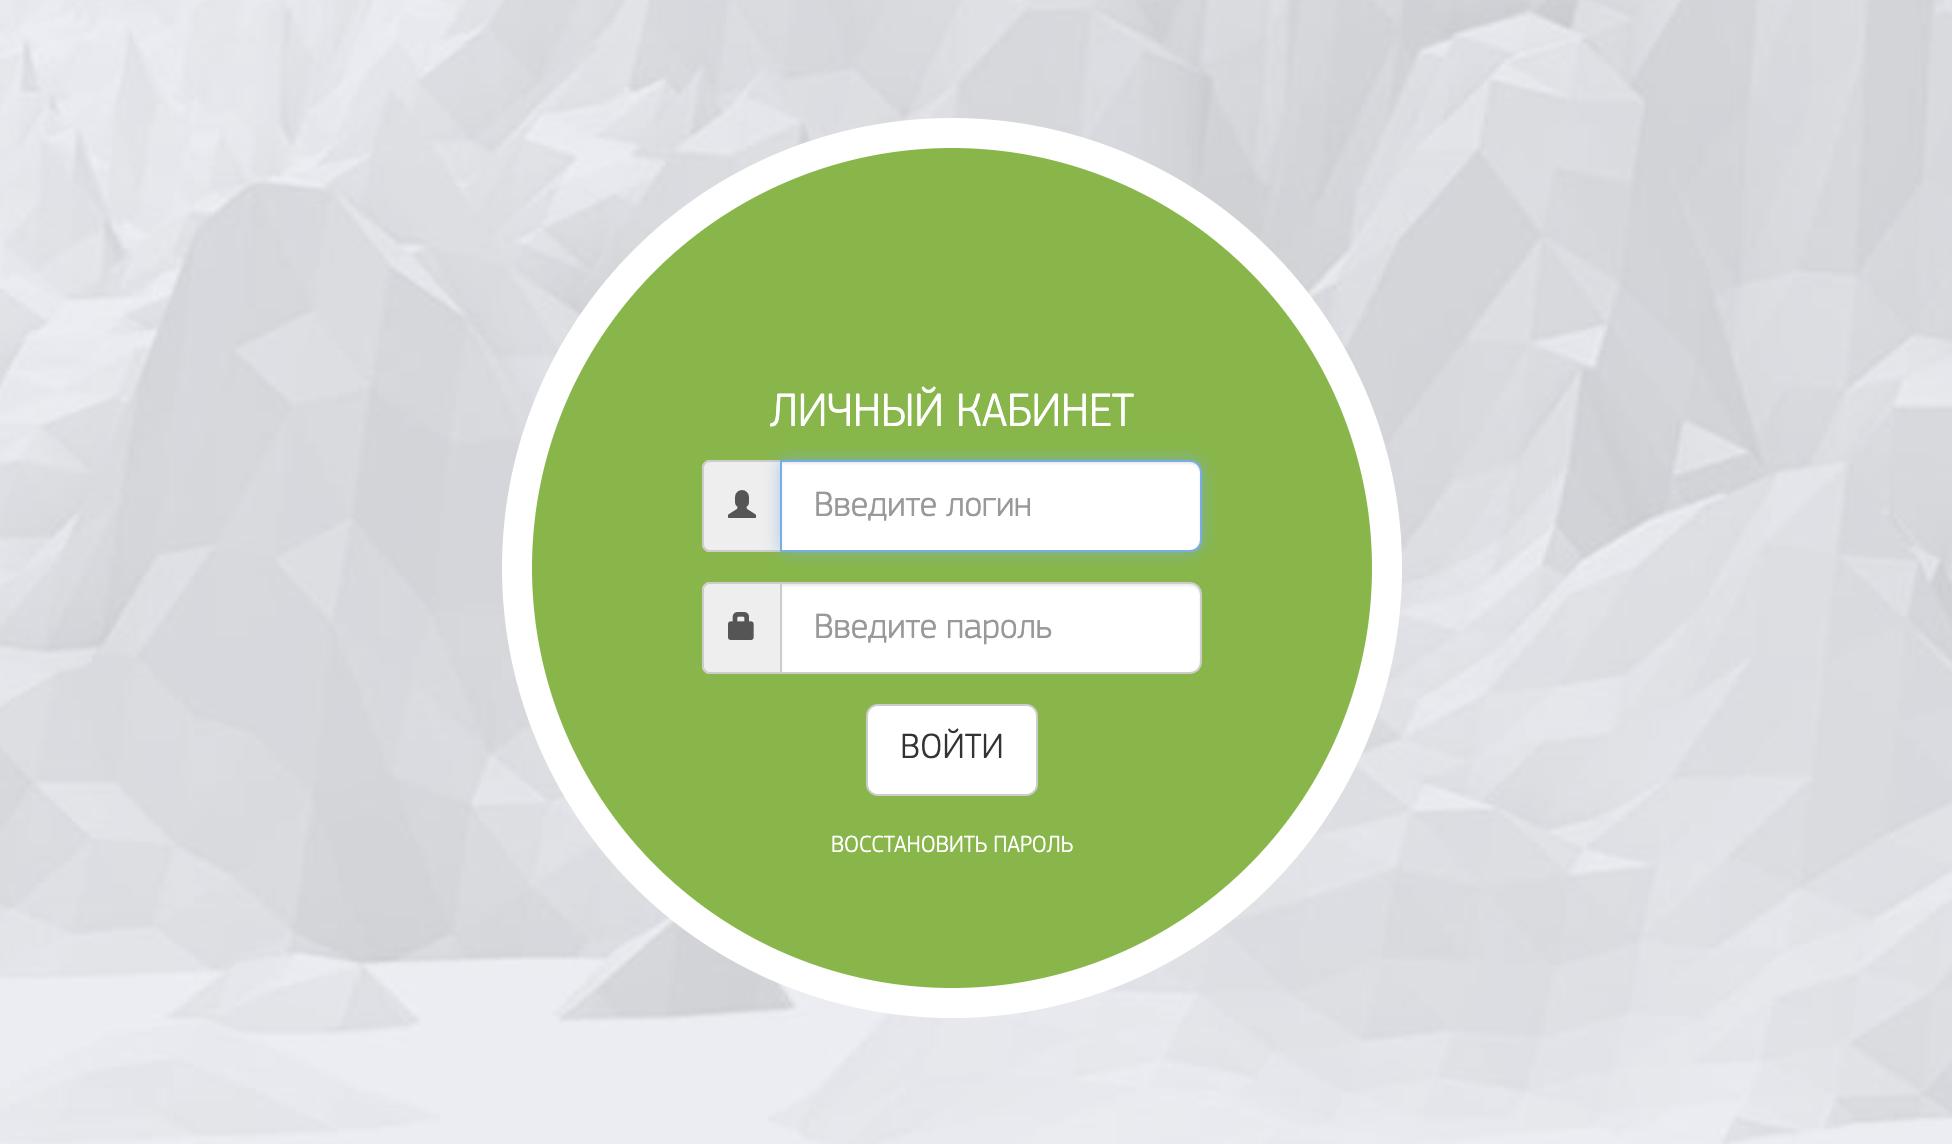 lk.stavropol.zelenaya.net_.png